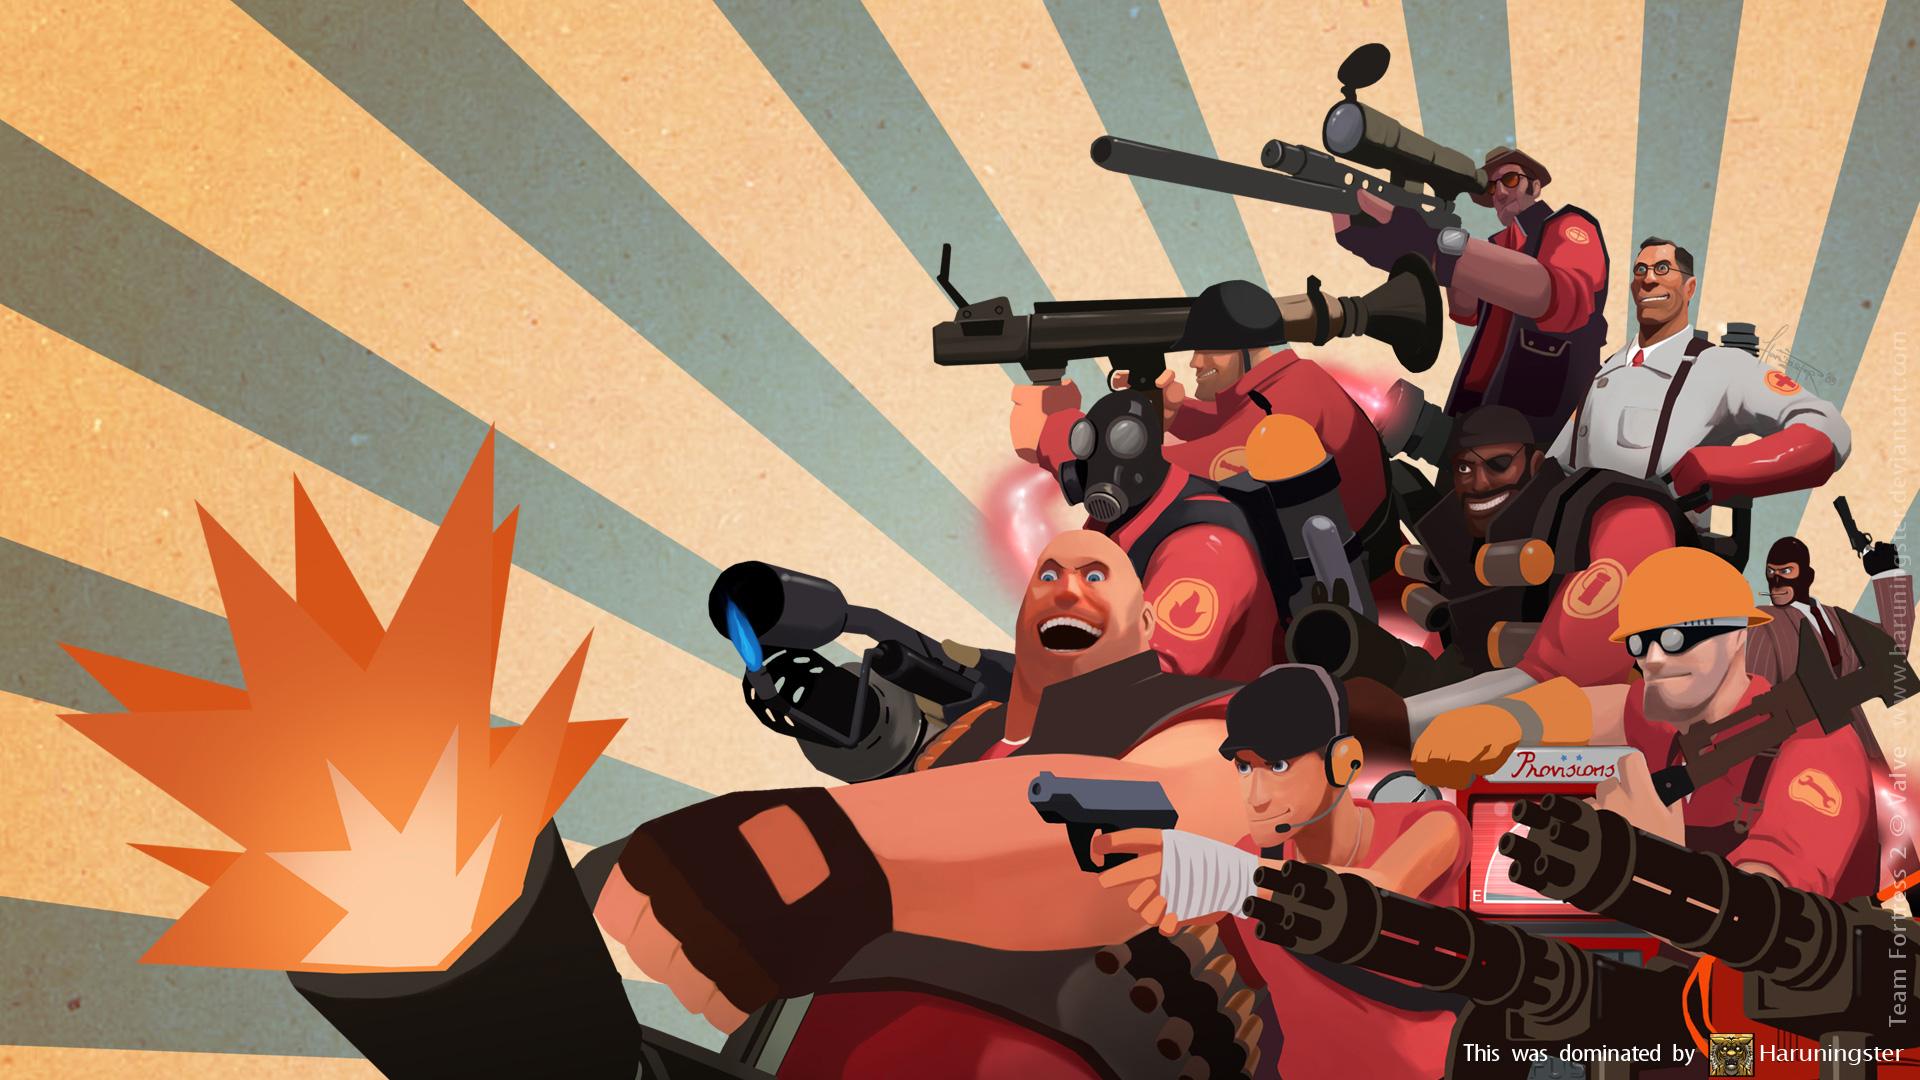 Free Team Fortress 2 Wallpaper in 1920x1080